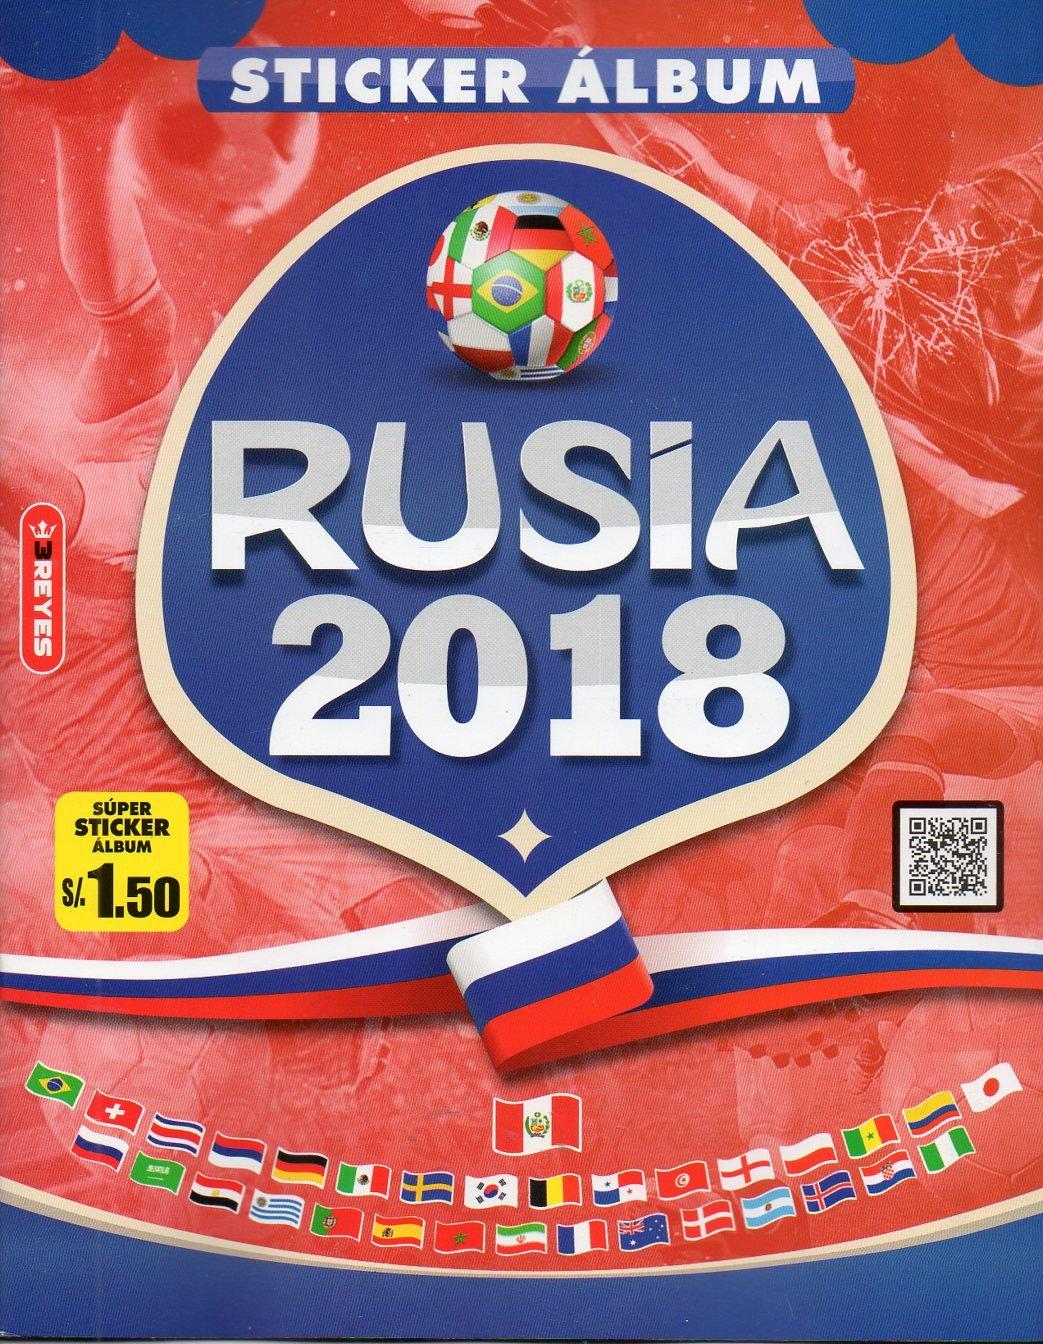 Album Mundial Futbol Rusia 2018 3 Reyes NAVARRETE FOOTBALL FIFA WORLD CUP RUSSIA 2018 STICKER PERUVIAN ALBUM: Amazon.es: 3Reyes, 3 Reyes, Navarrete: Libros